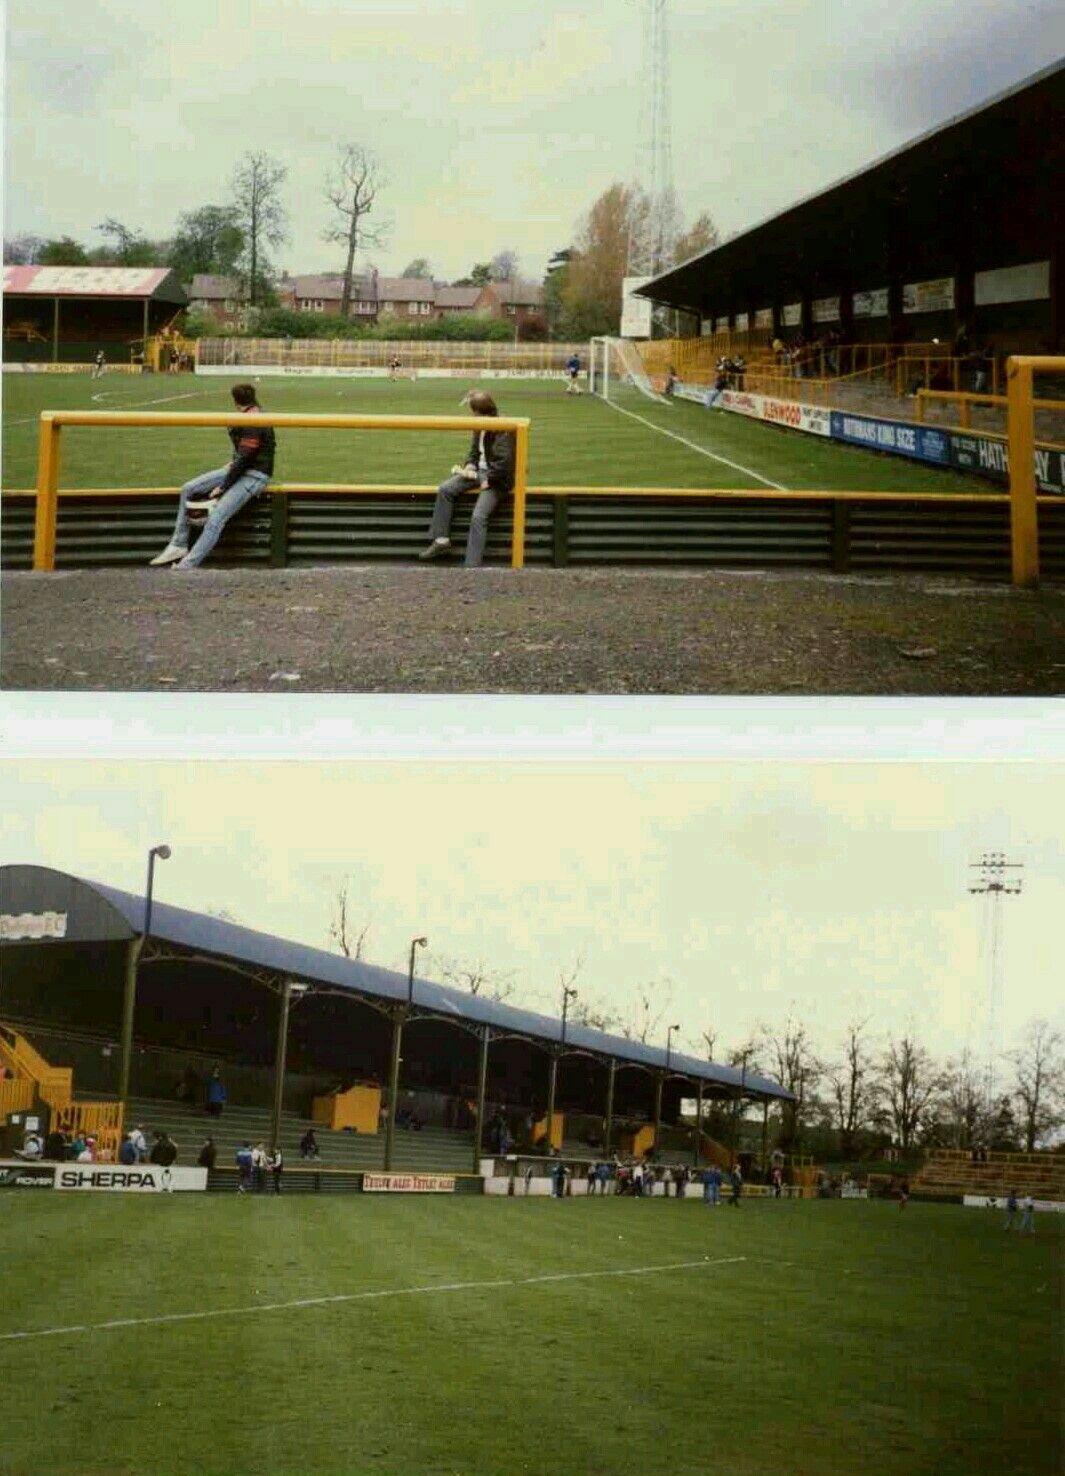 Feethams darlington in the 1980s stadium pics